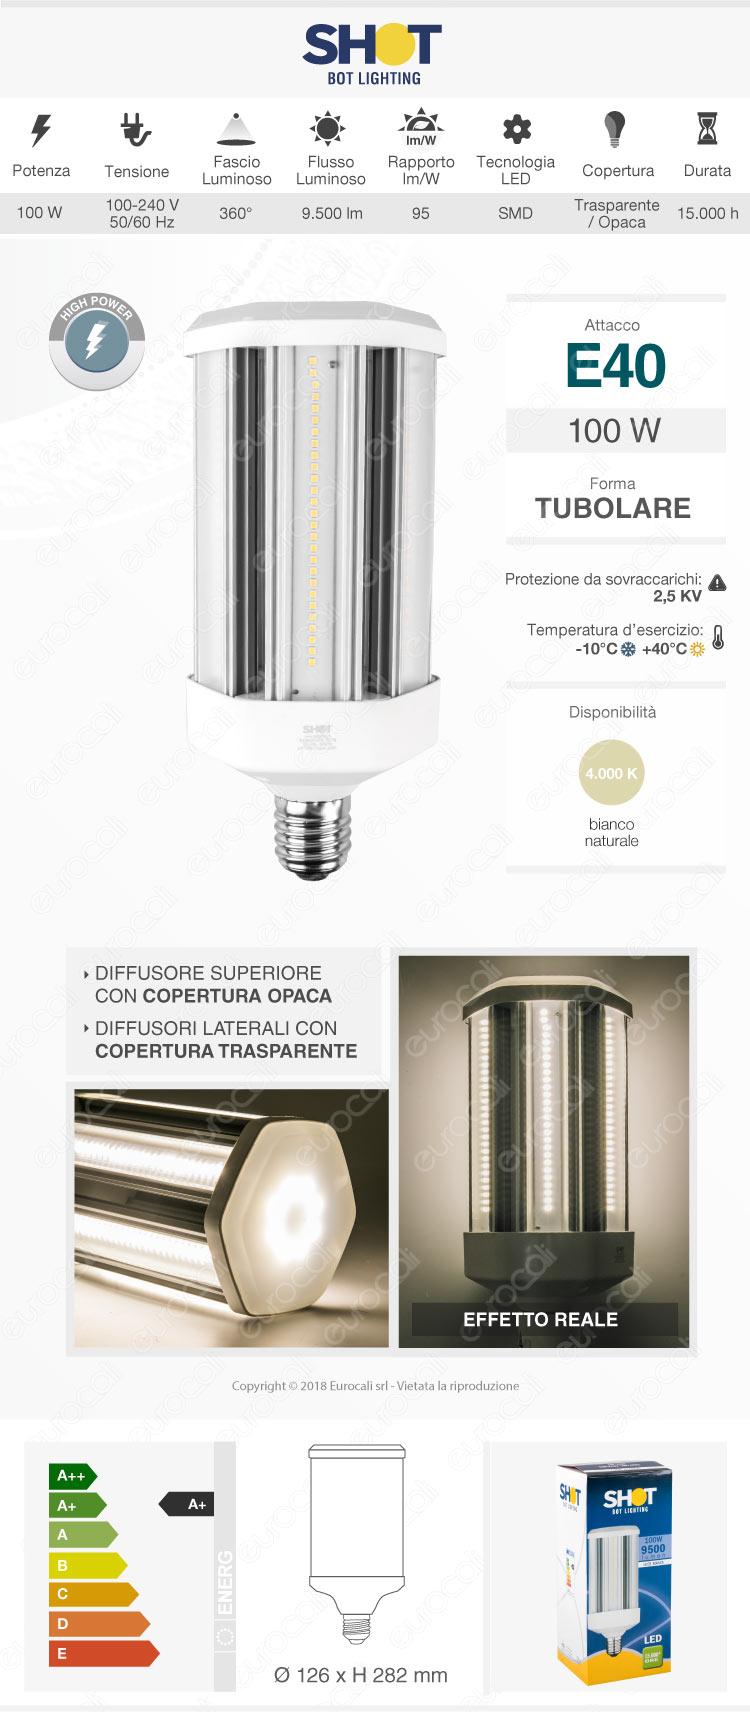 Lampadina LED E40 100W High Power Tubolare Bot Lighting L